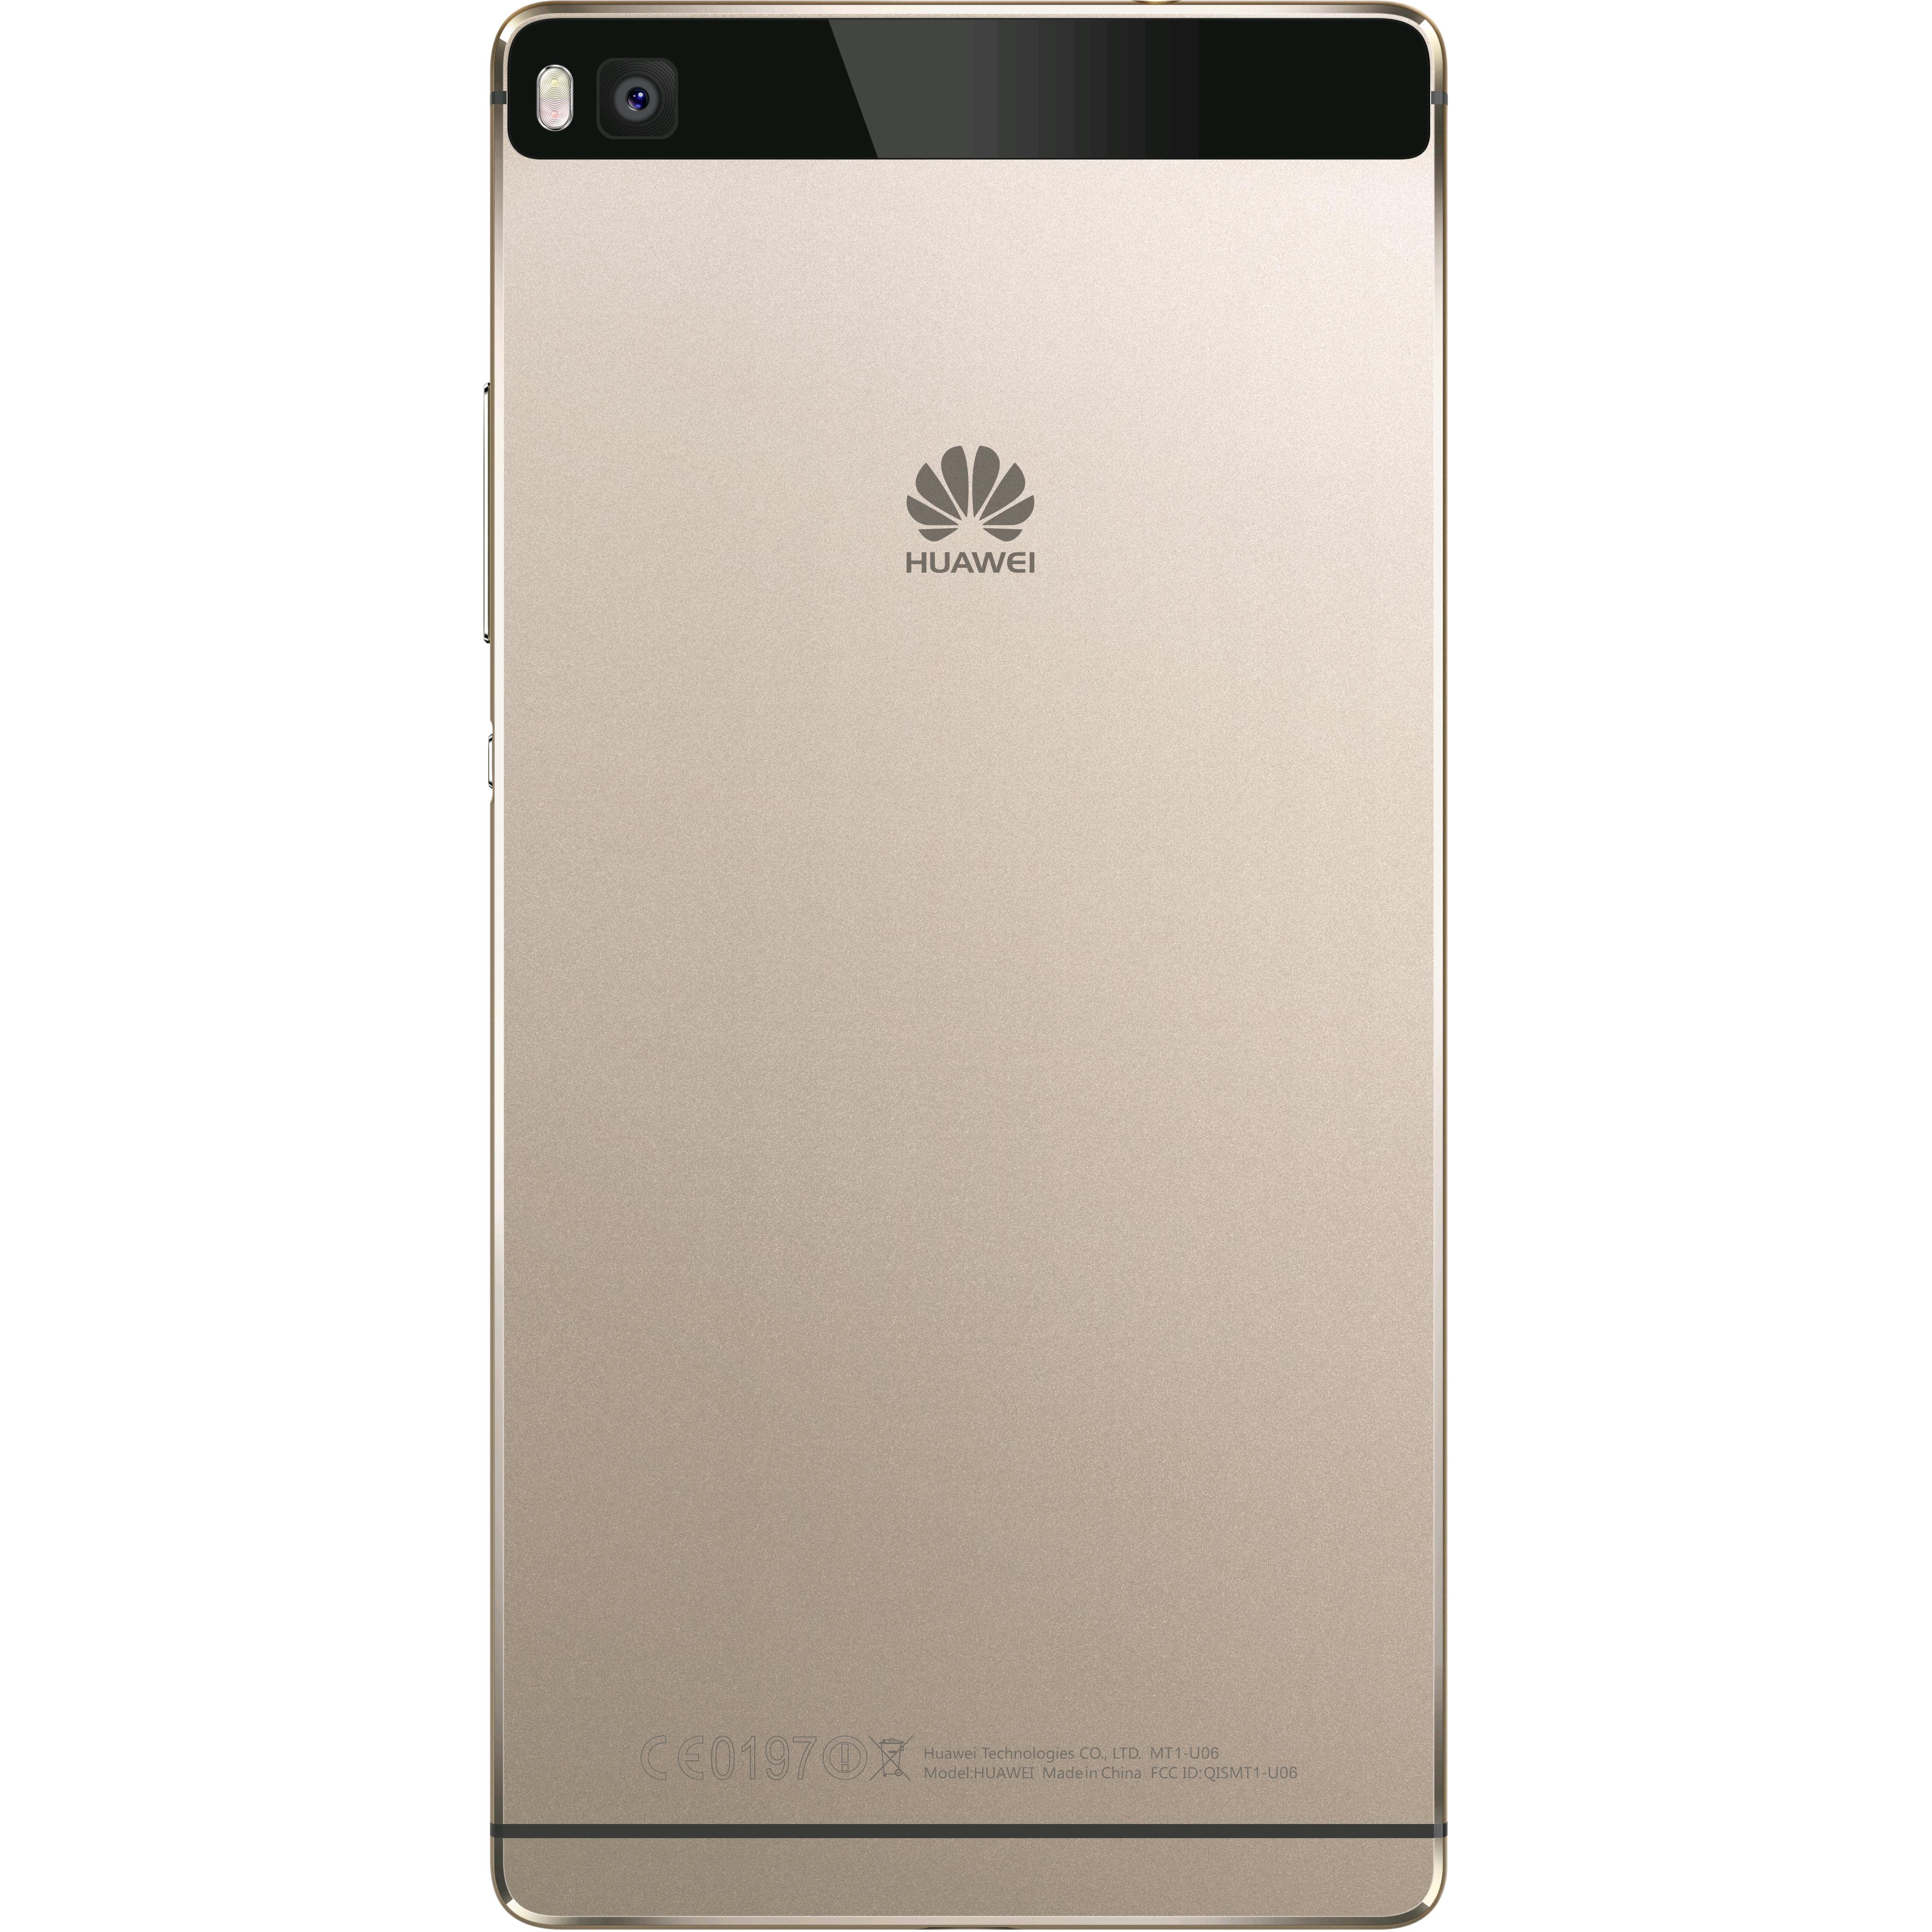 Huawei P8 Premium 233 Tui 224 Rabat Offert Luxury Gold Vmall Official Huawei Amp Honor Store